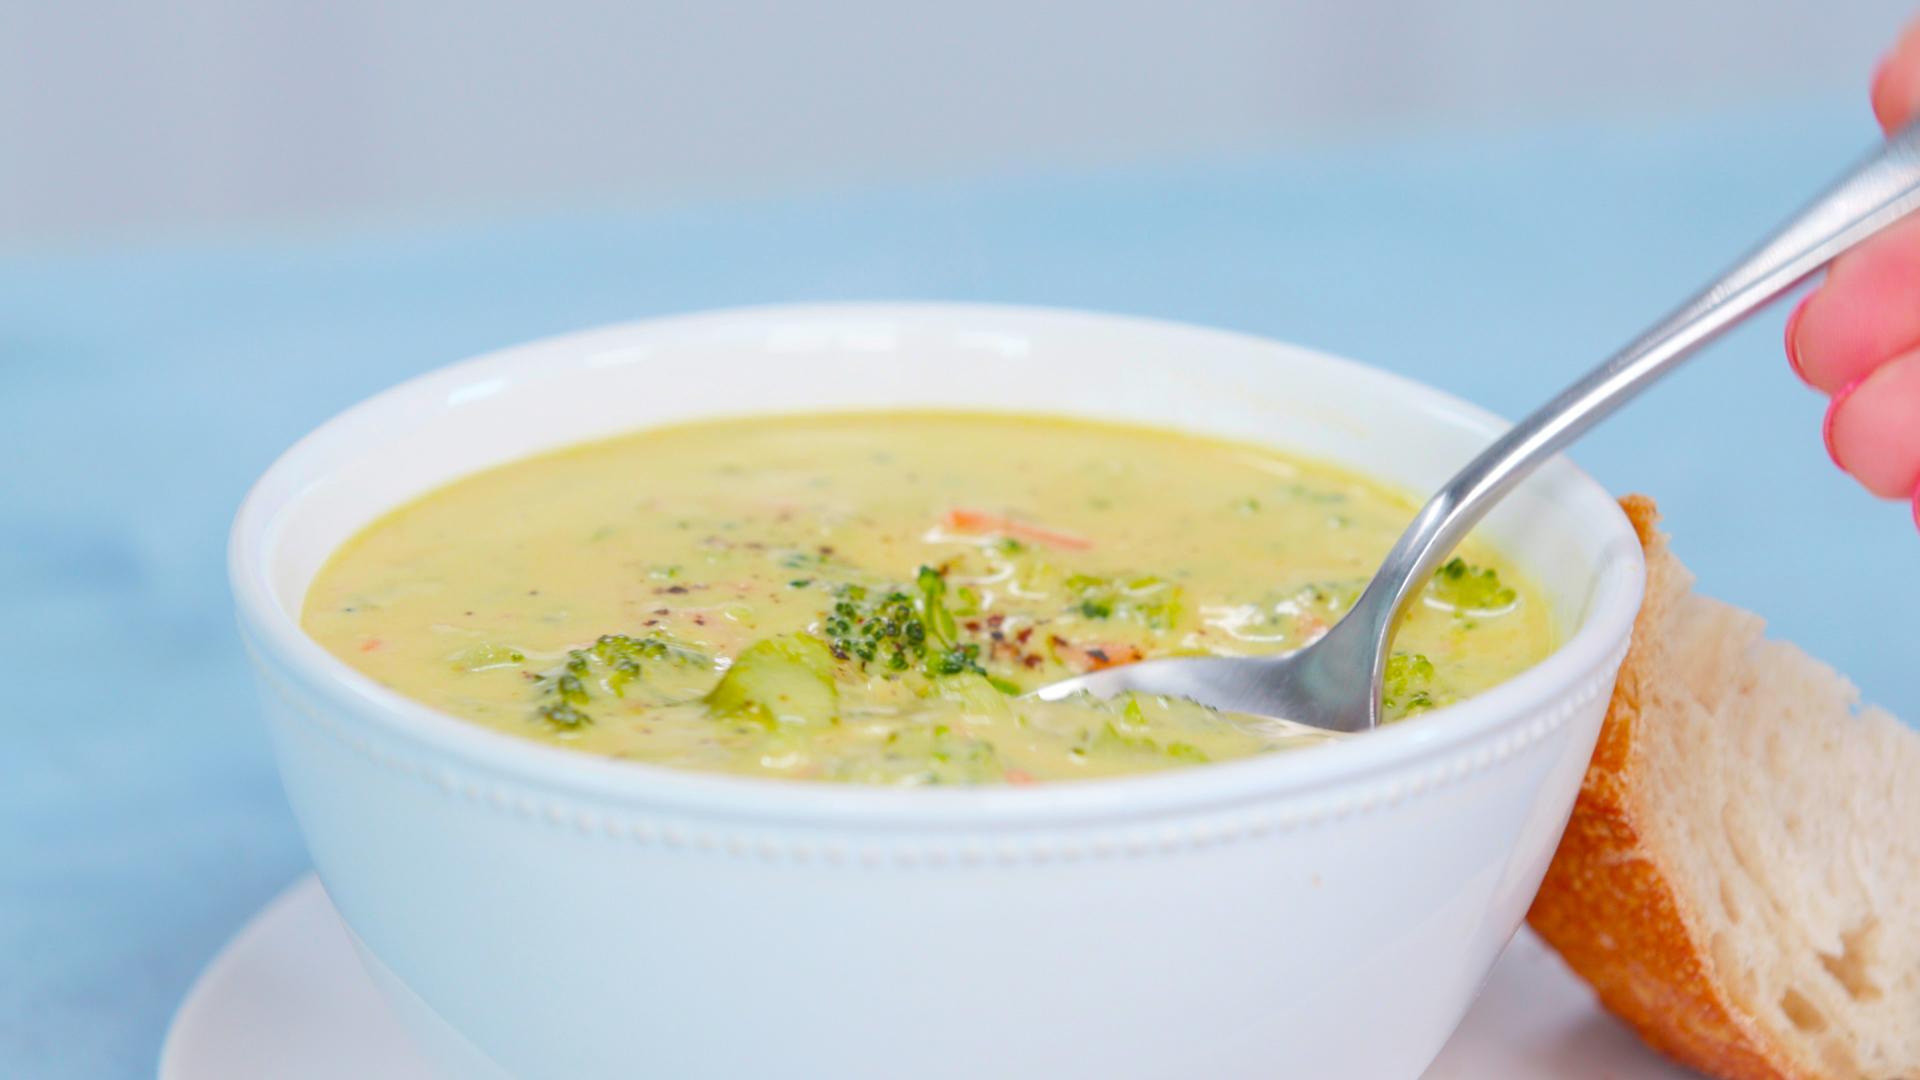 Copycat Panera Broccoli Cheddar Soup